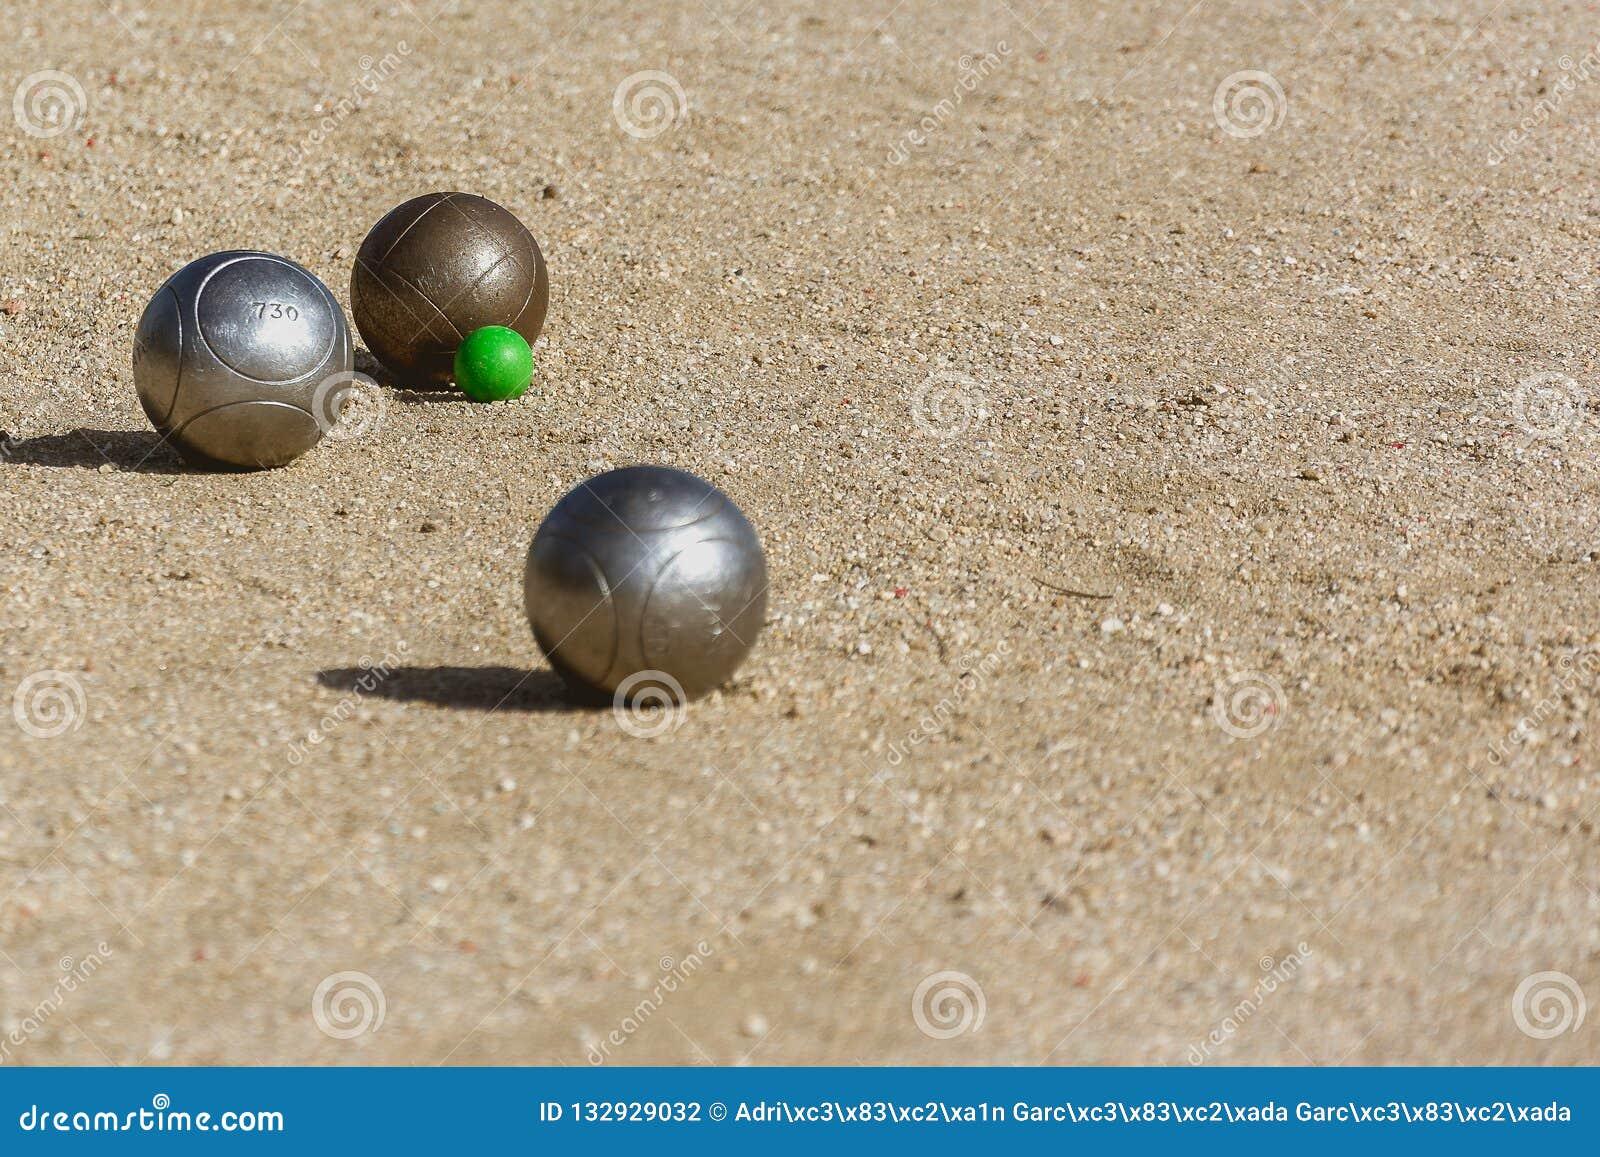 Petanque-Bälle auf dem Boden des Spielgerichtes